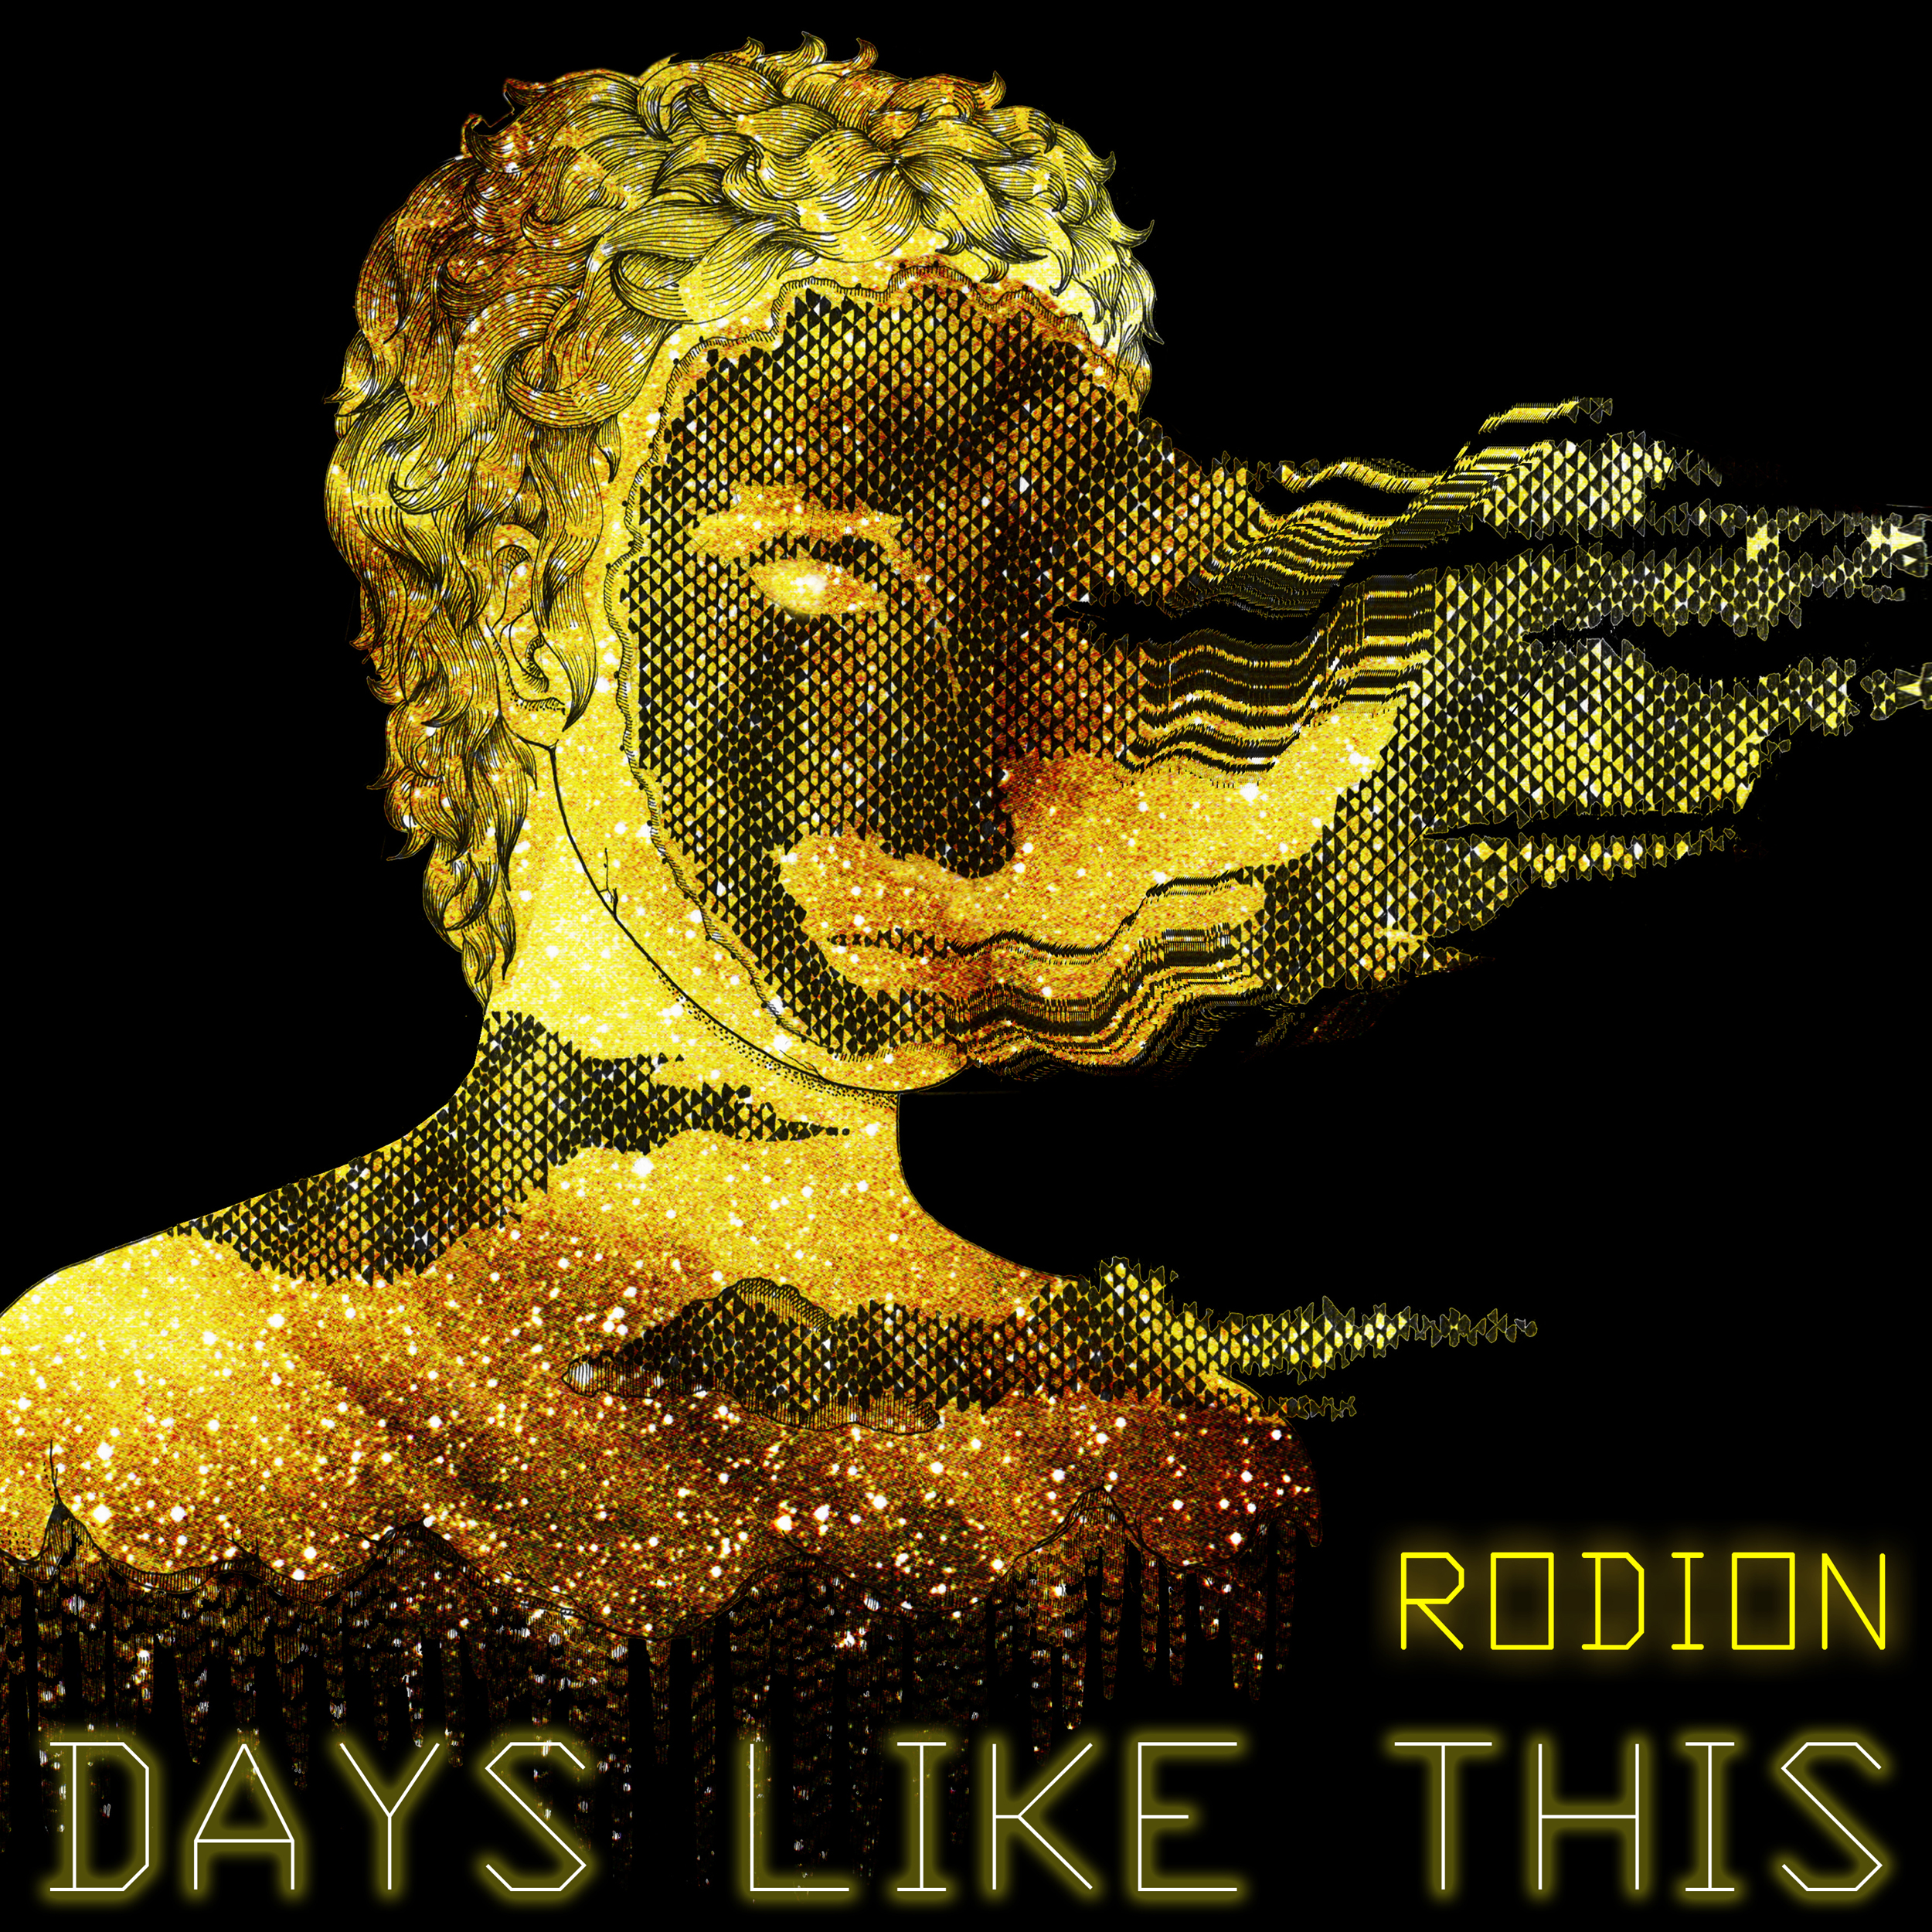 rodion_days_like_this_-_rocco_012_artwork_2500x2500_75dpi.jpg